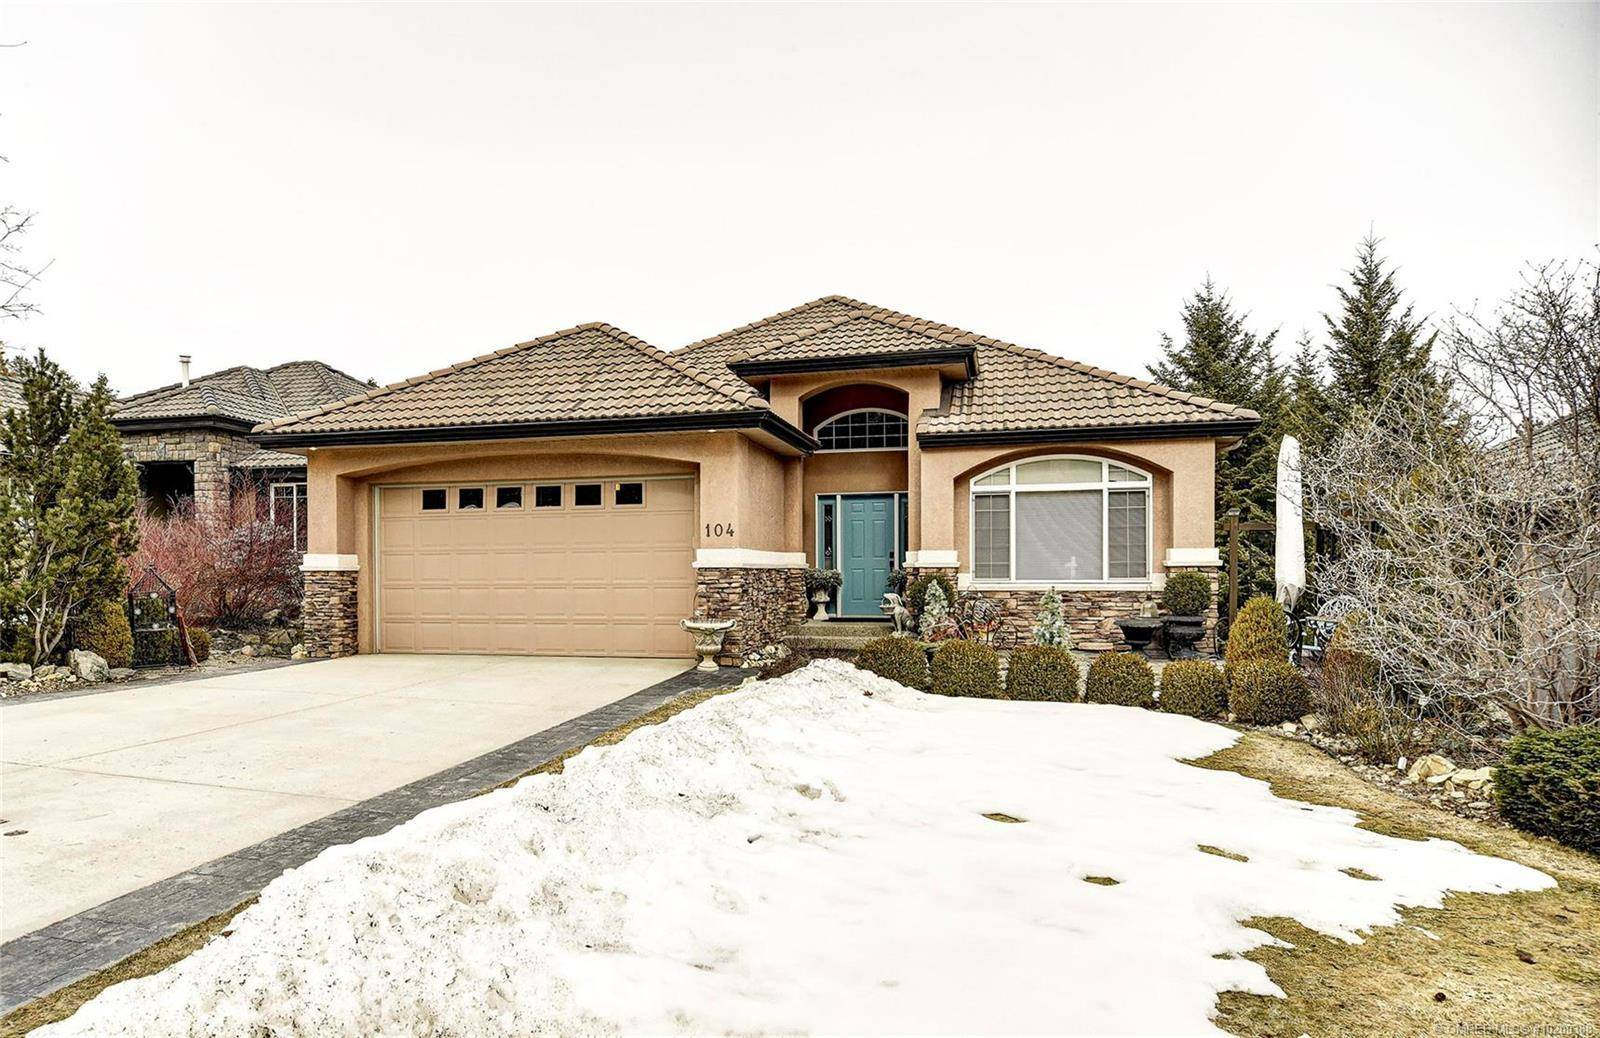 House for sale at 1950 Capistrano Dr Unit 104 Kelowna British Columbia - MLS: 10200388